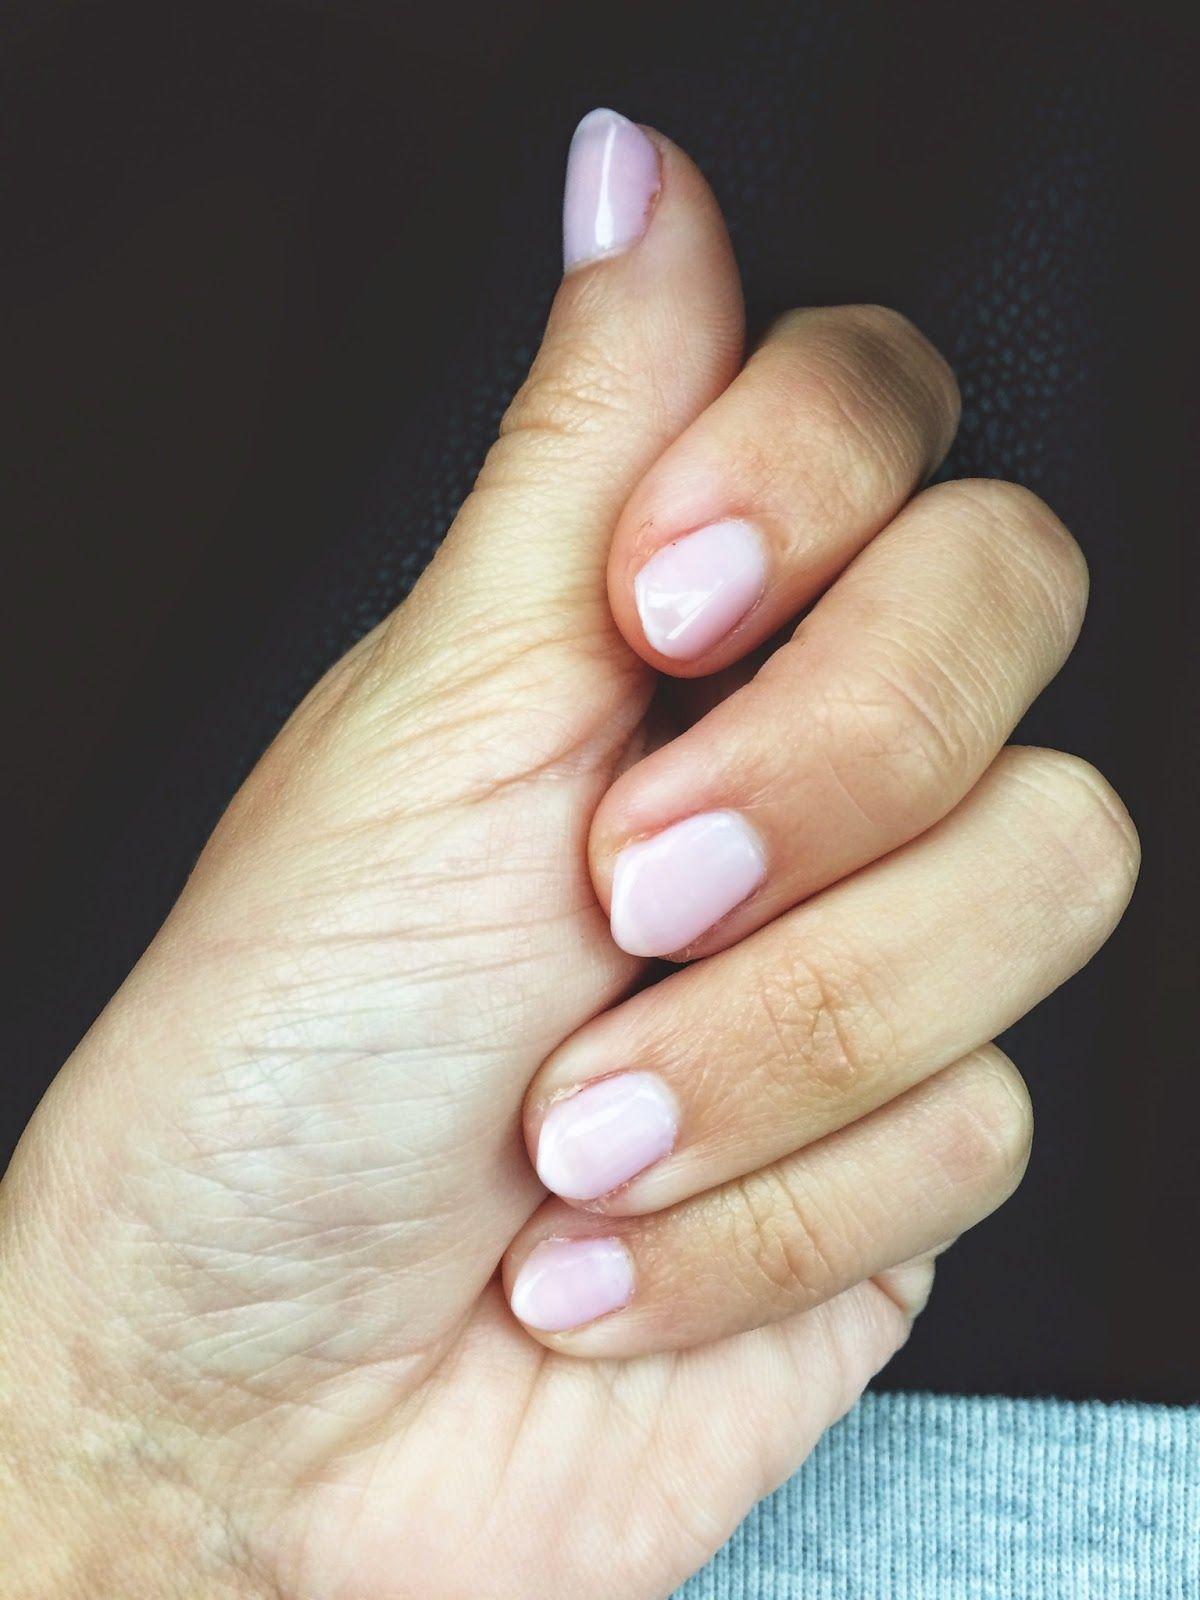 The Beetique Short Almond Nails Short Almond Nails Almond Nails Almond Shape Nails